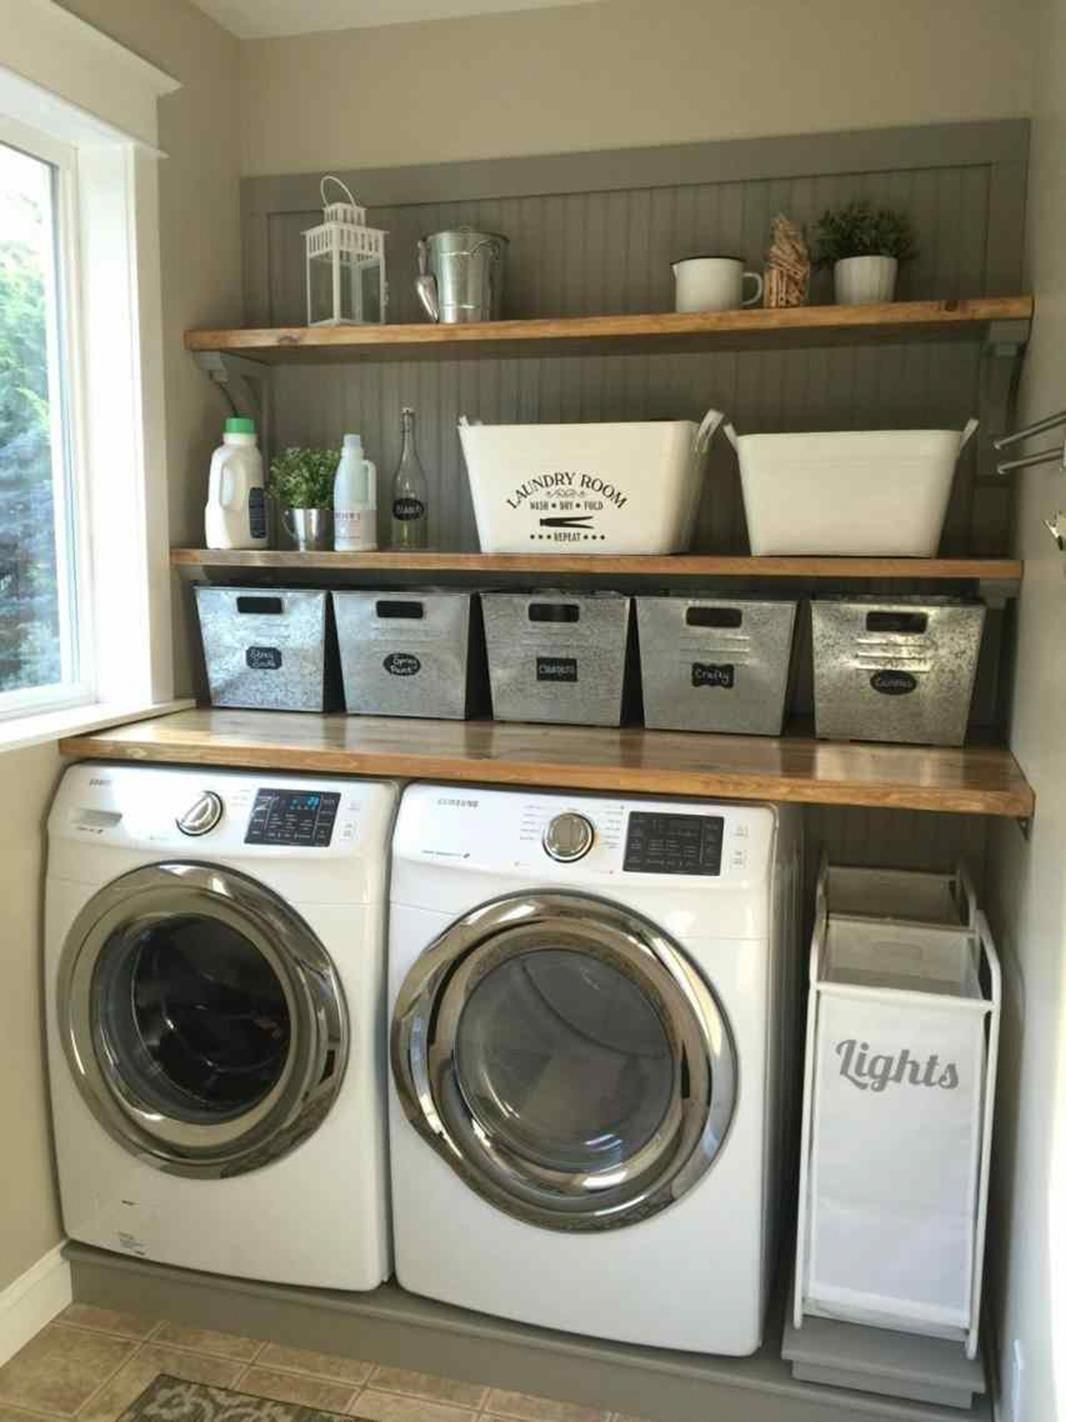 Best cheap ikea cabinets laundry room storage ideas 14 homedecor